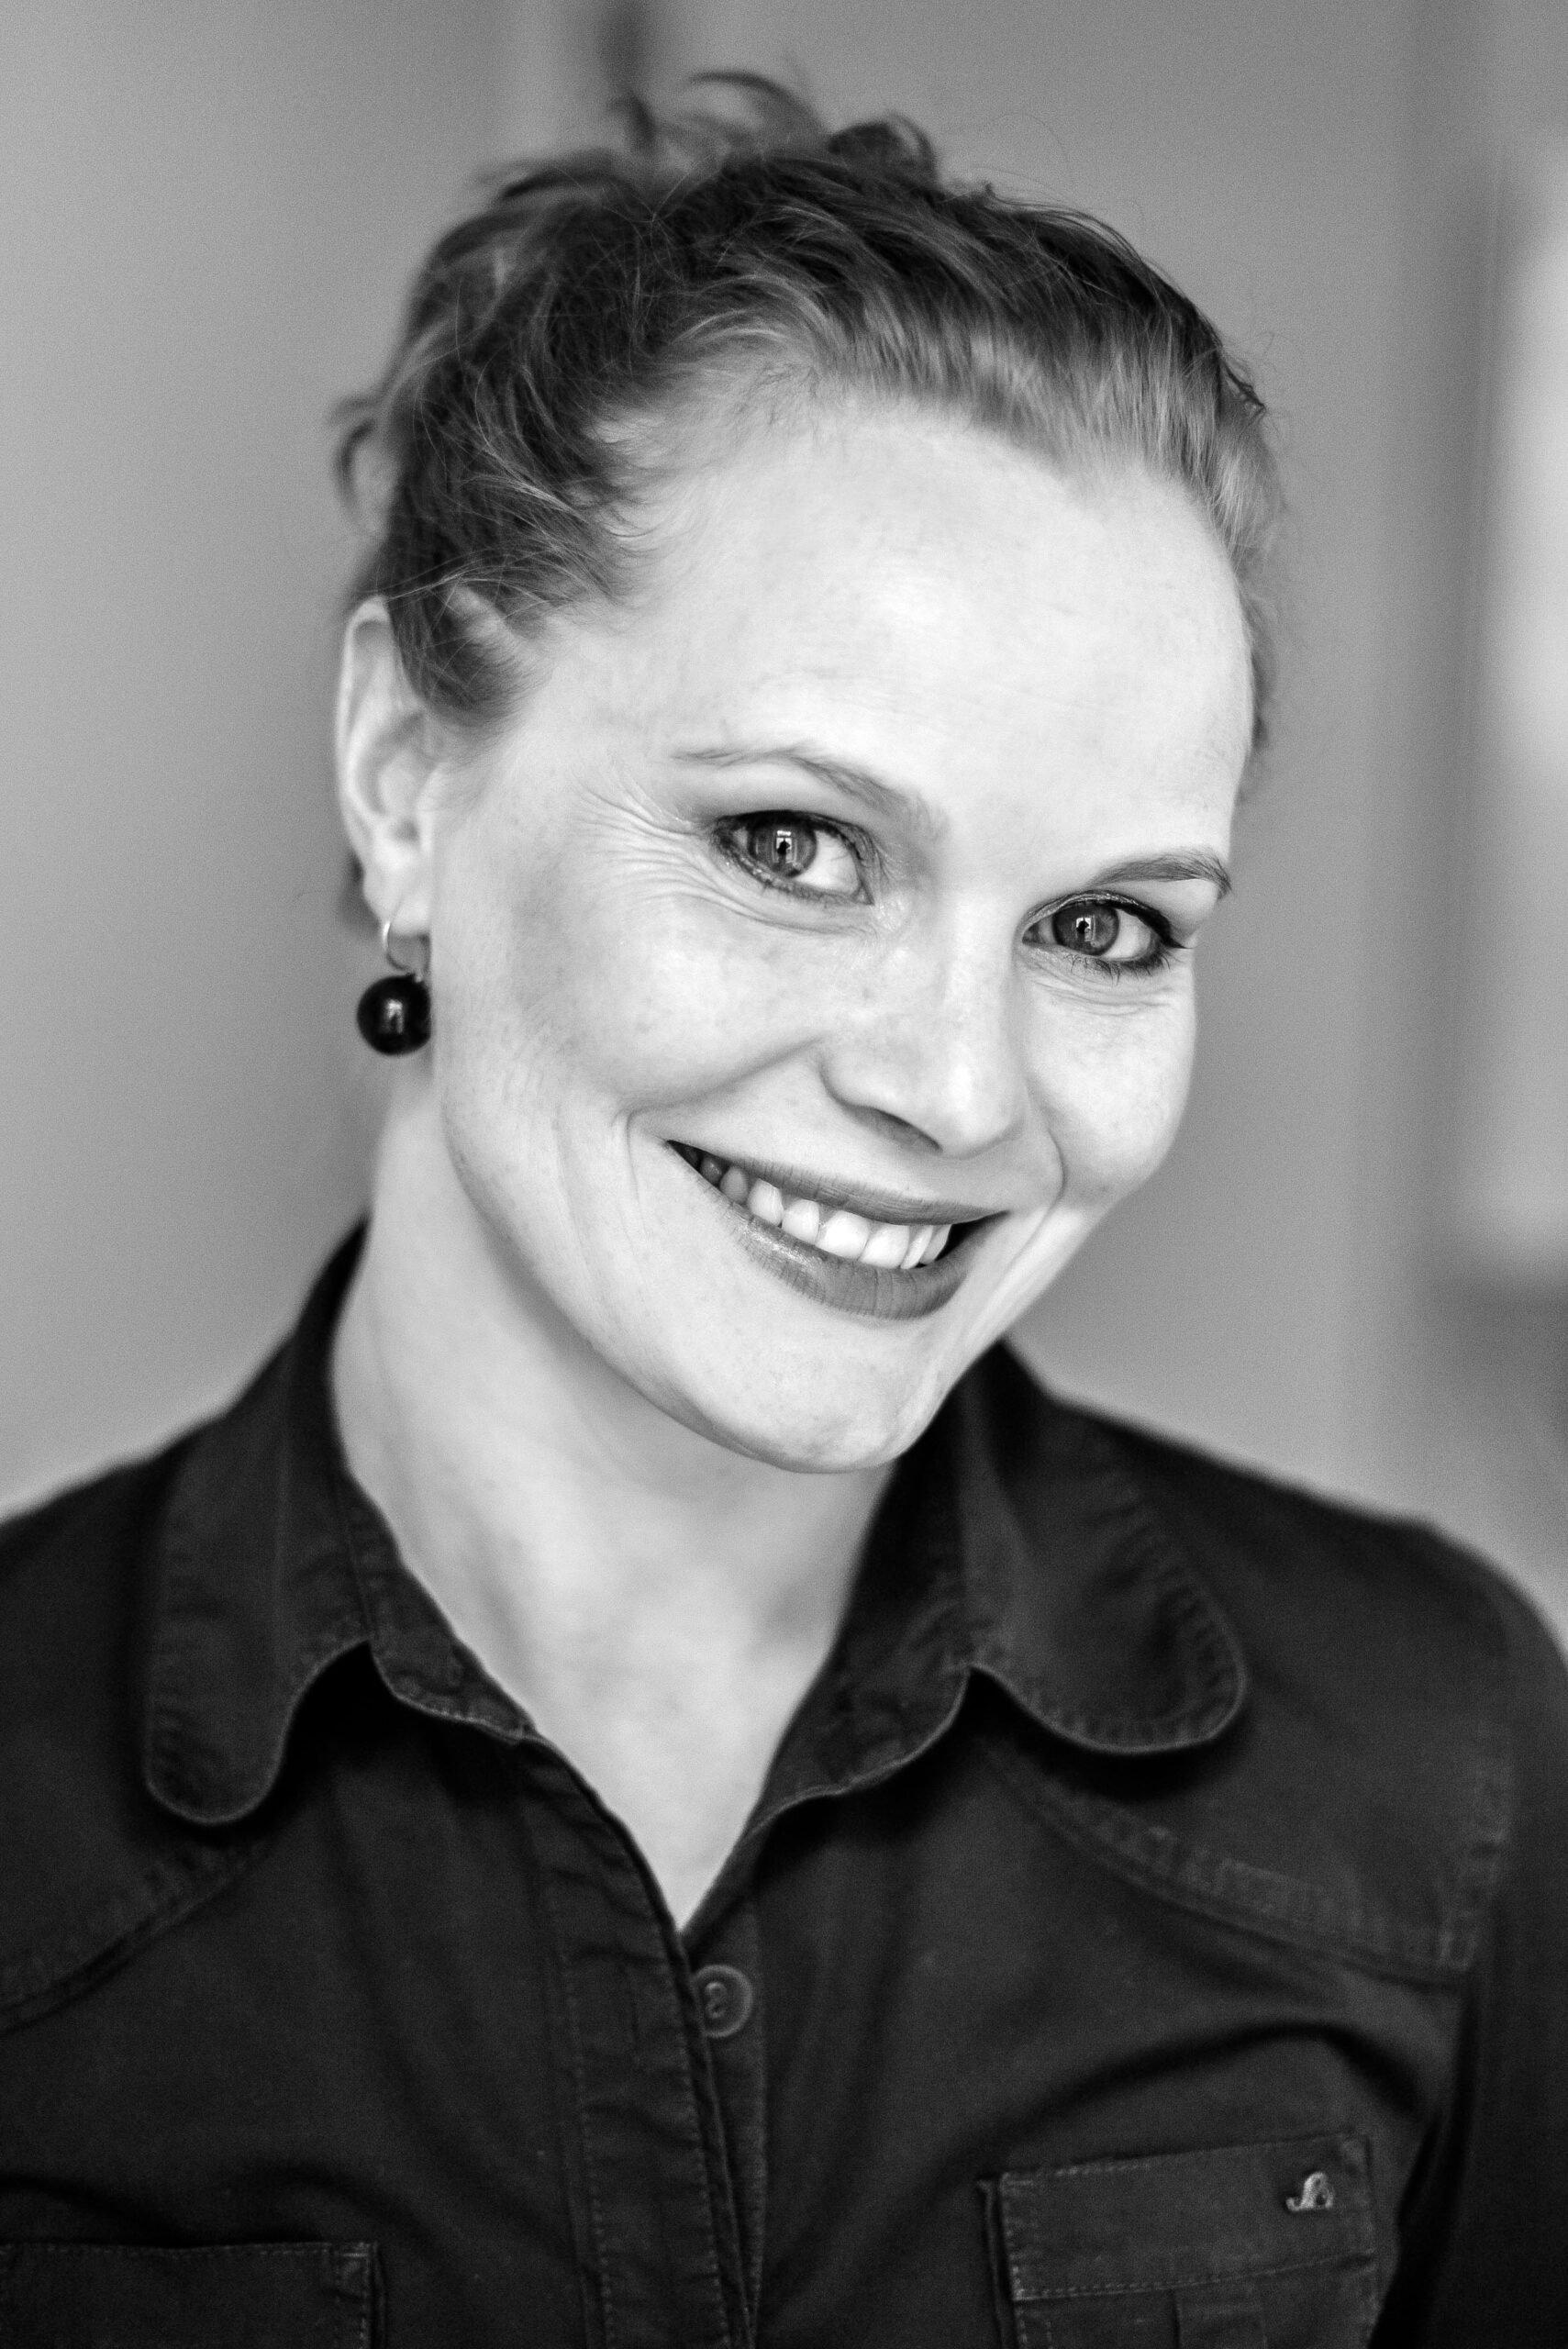 Ms. Annett Böhm